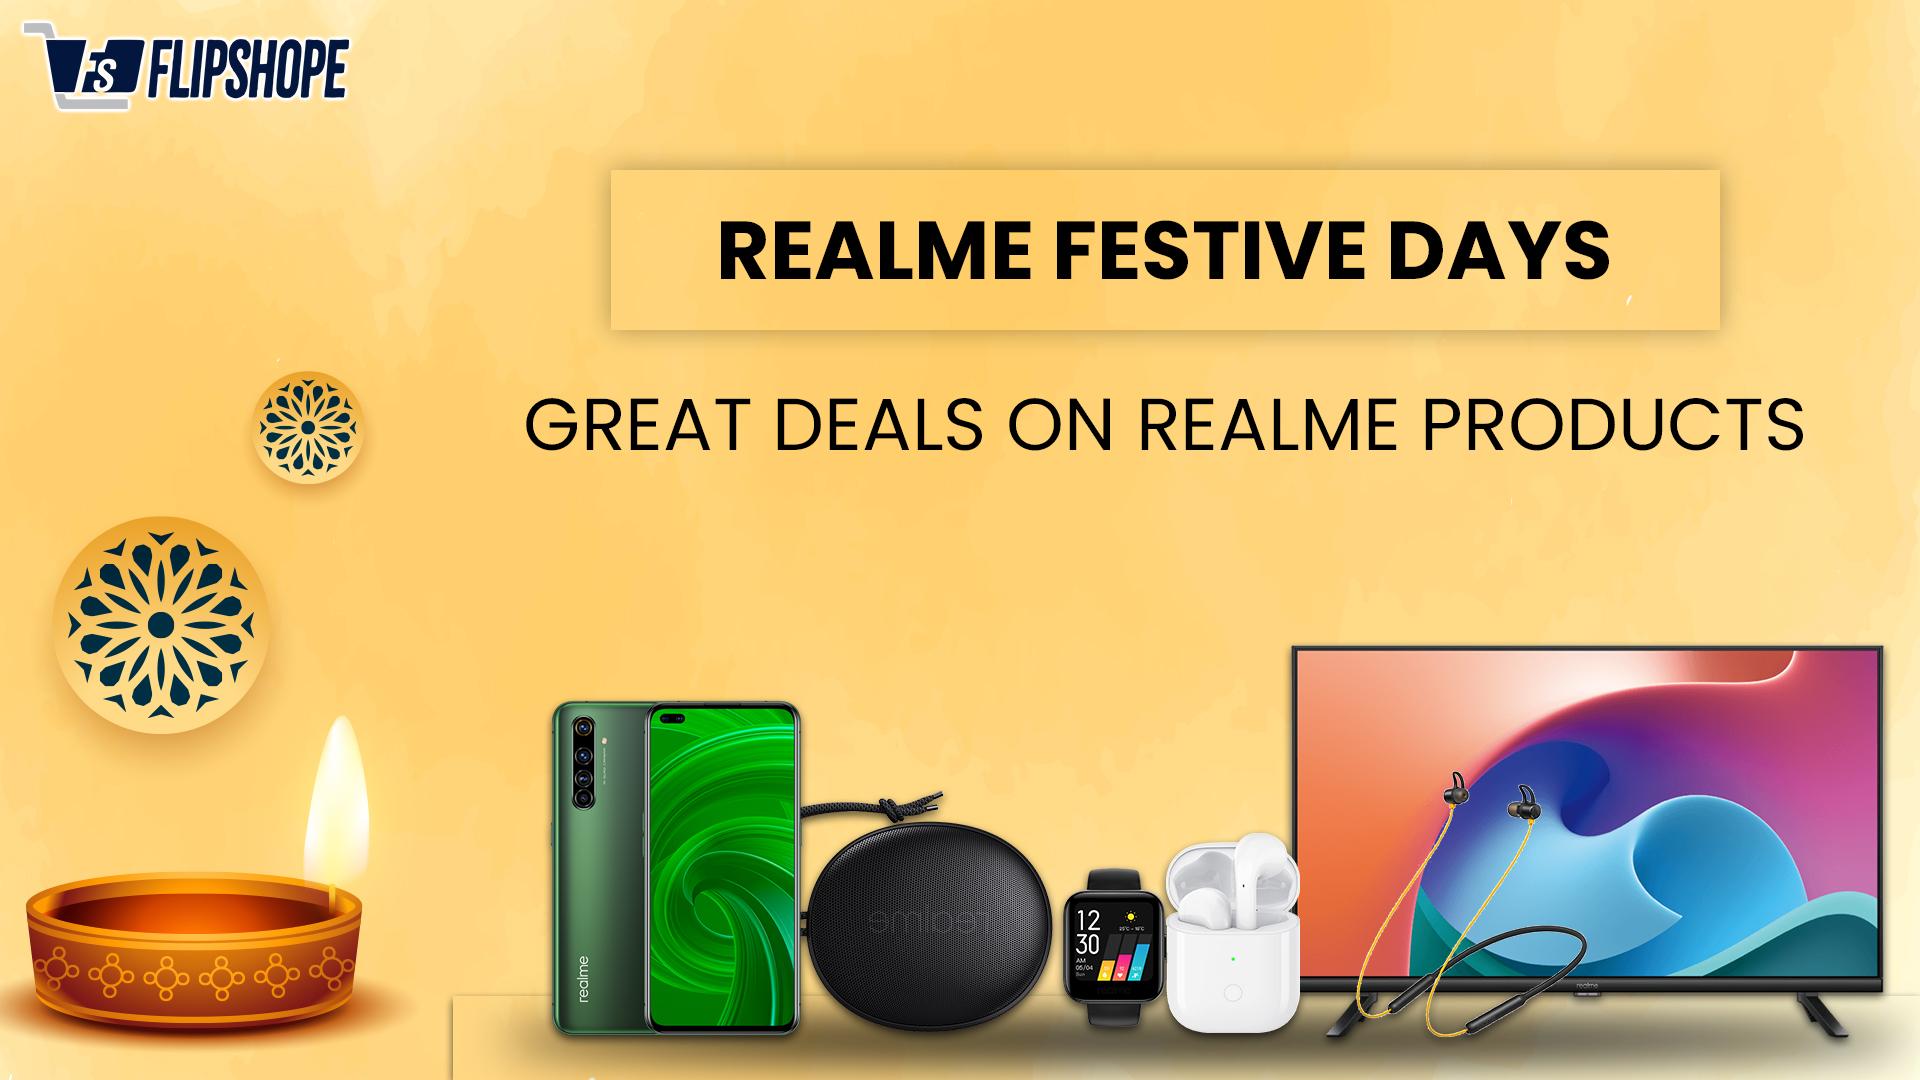 realme festive days